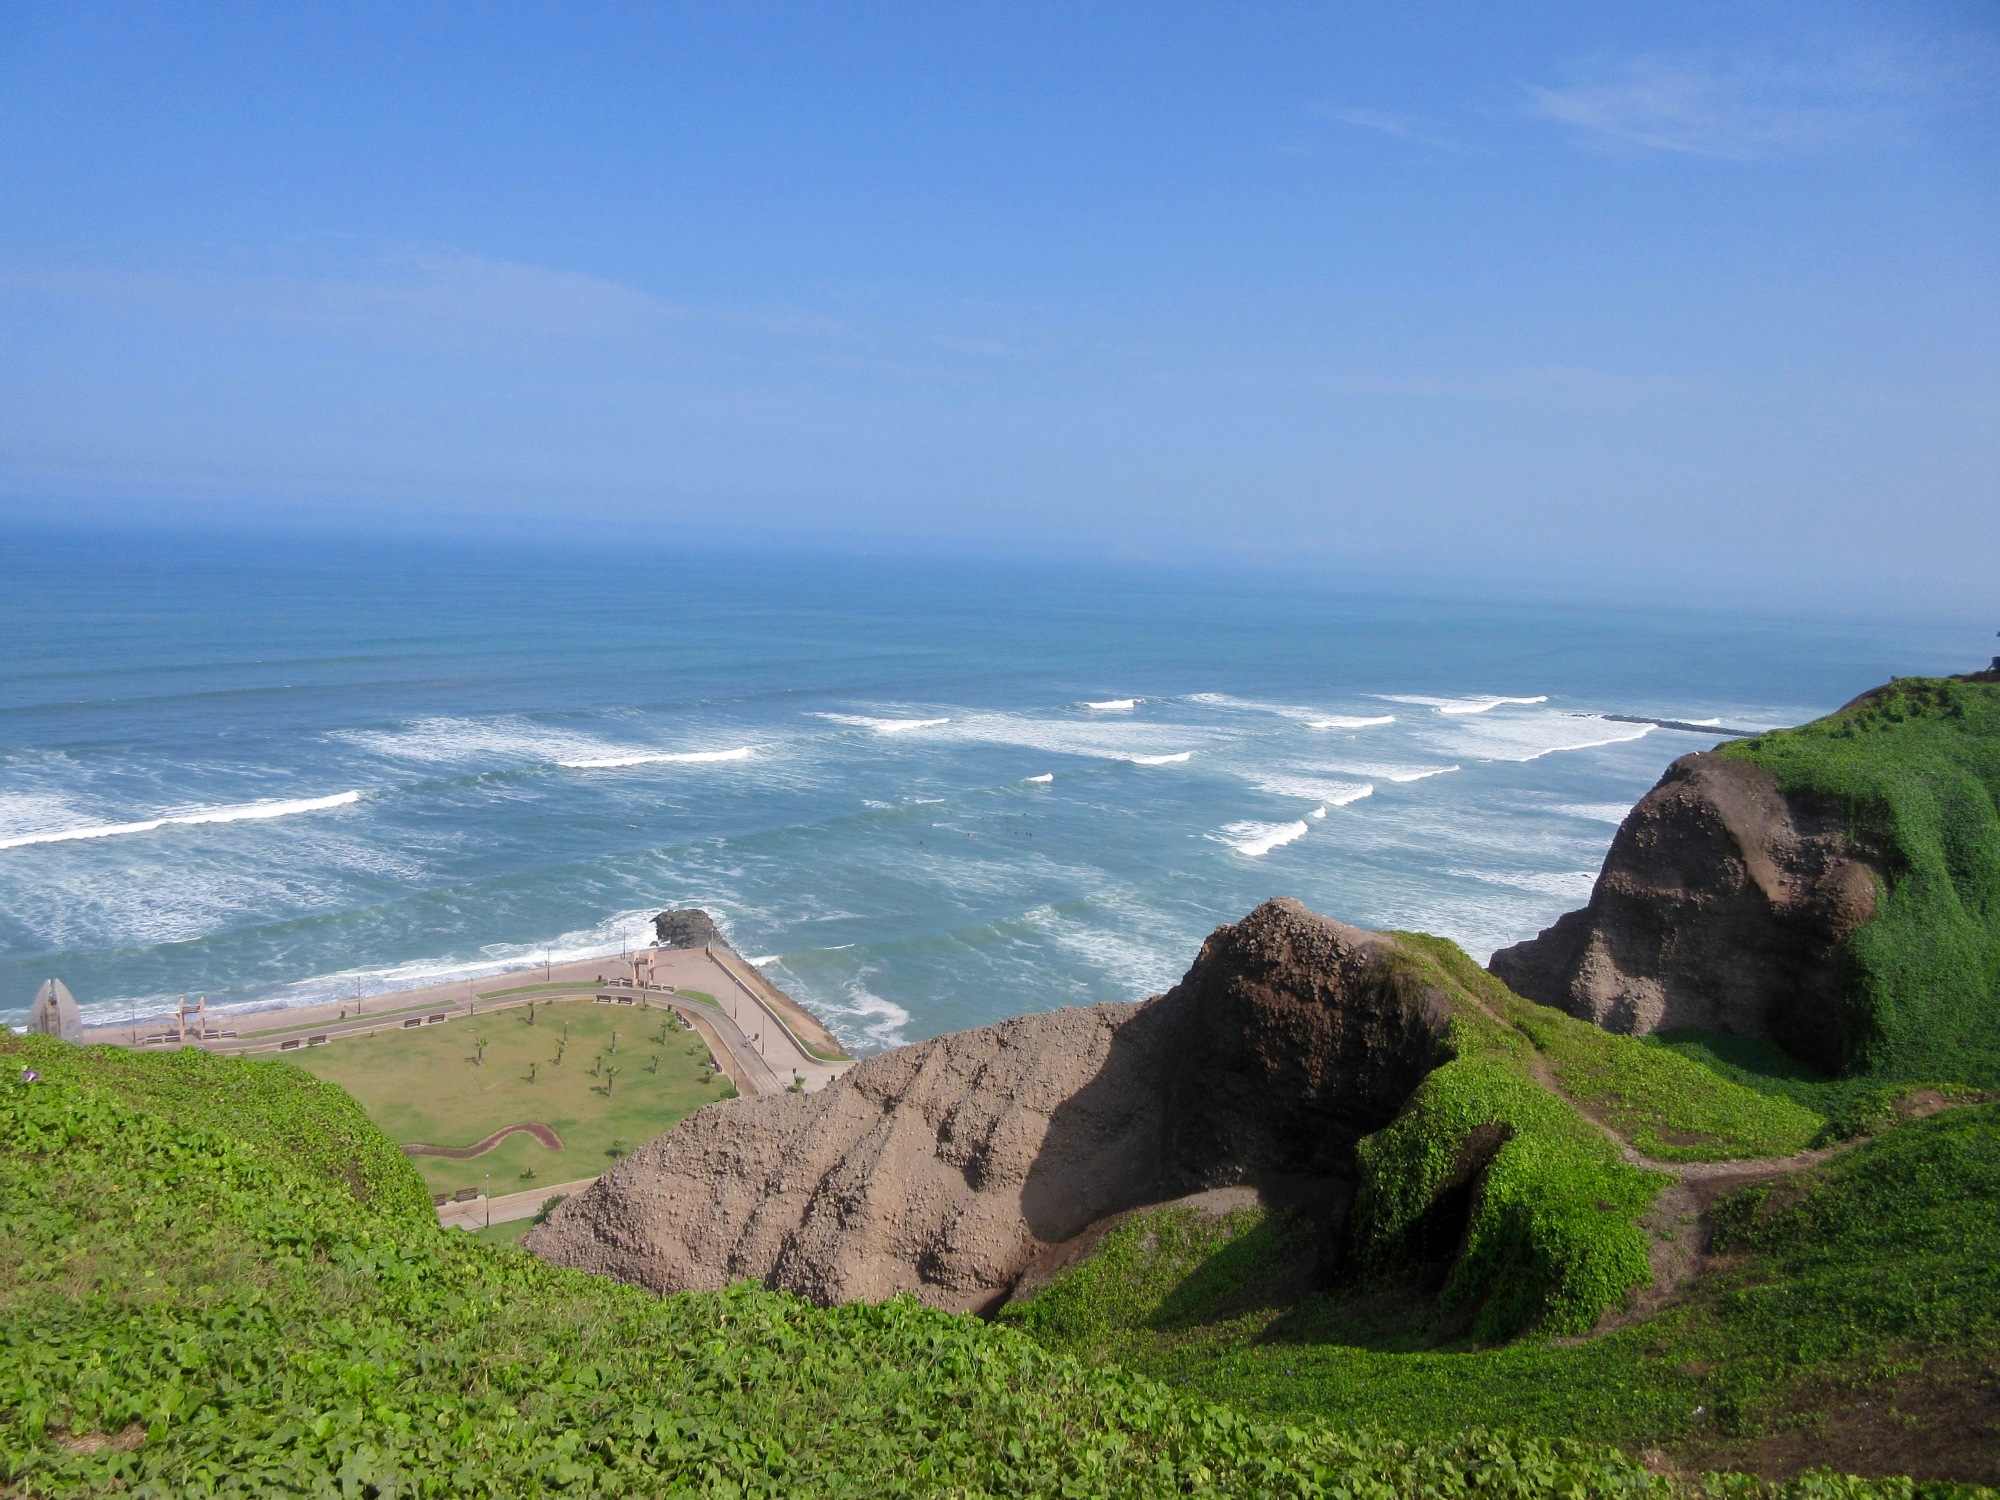 View of the coast in Miraflores, Lima Peru